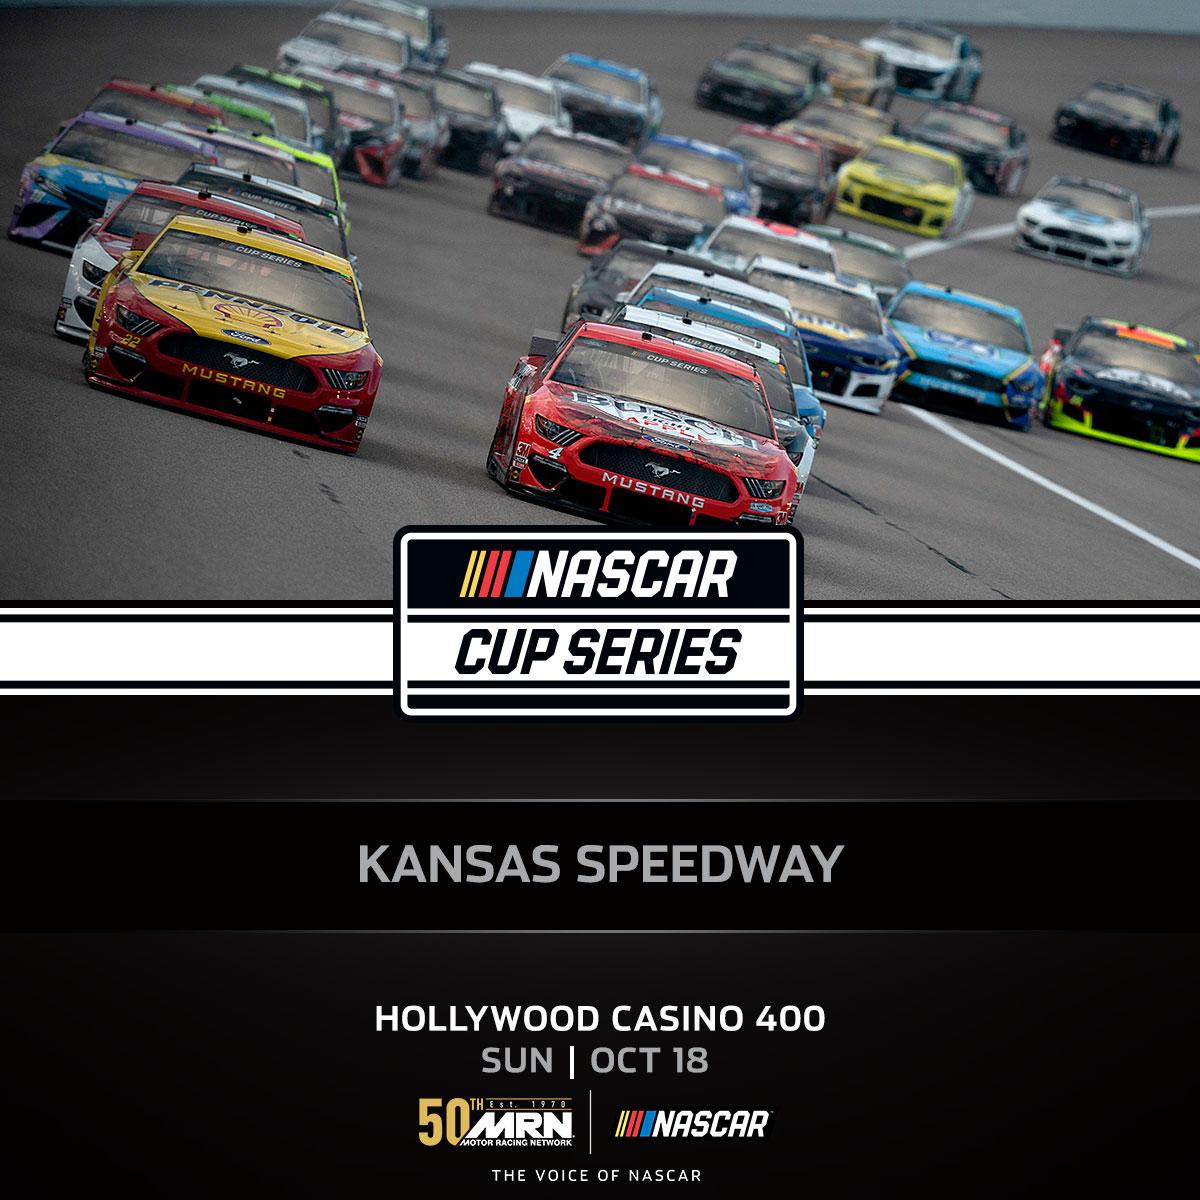 WE ARE LIVE @kansasspeedway for the #HC400 📻: Local Affiliate: bit.ly/2MfJ5XI 💻: bit.ly/MRNbroadcast #NASCAR Mobile 📱:nas.cr/2qeyRNK @SIRIUSXM Channel 90 @REradioz Scanner: 454.000 #AskMRN | #NASCARPlayoffs